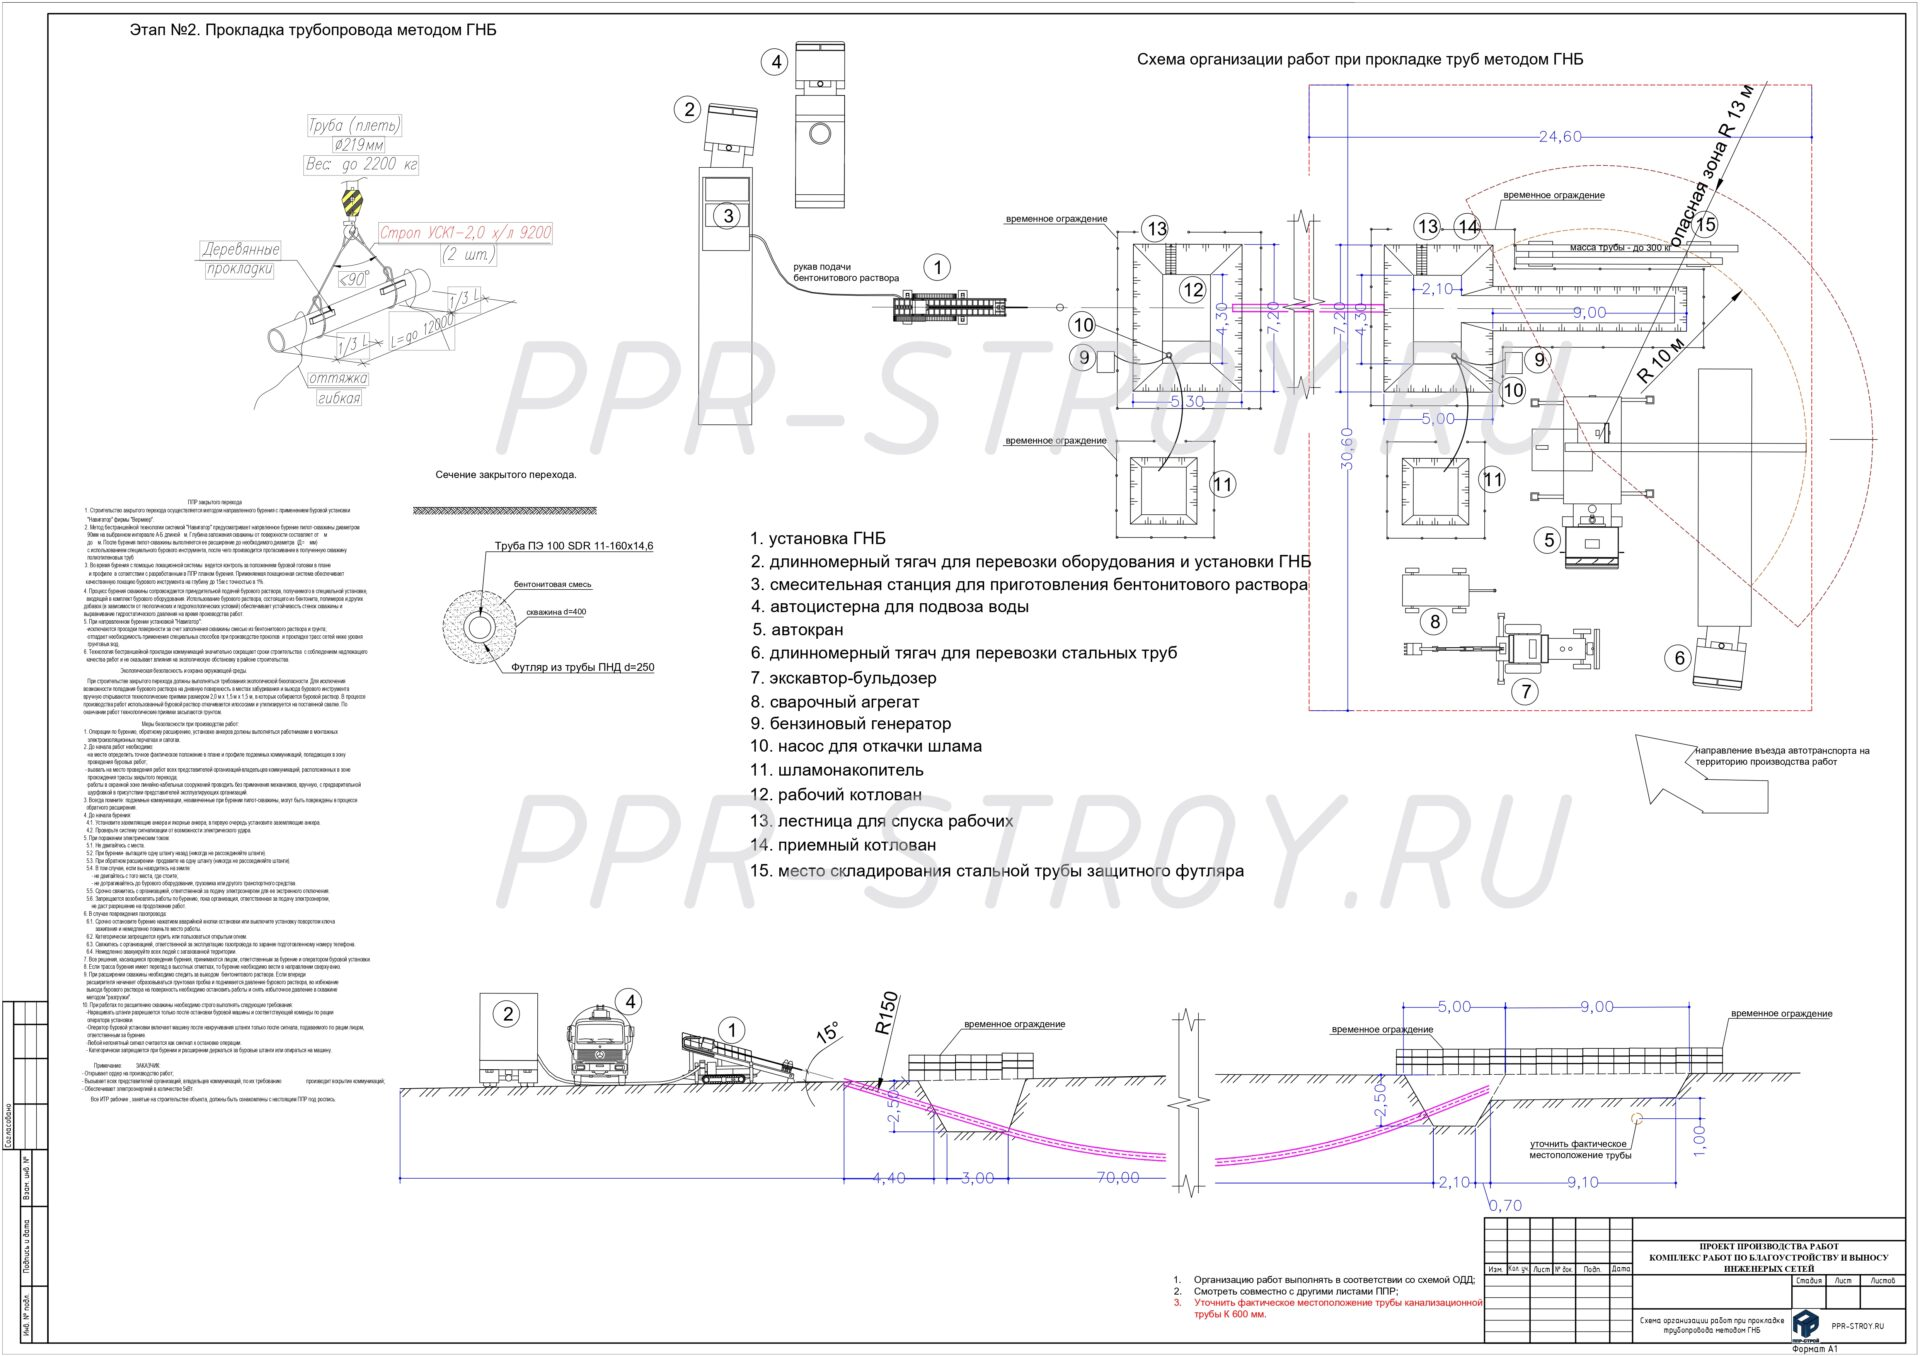 Схема организации работ при прокладке